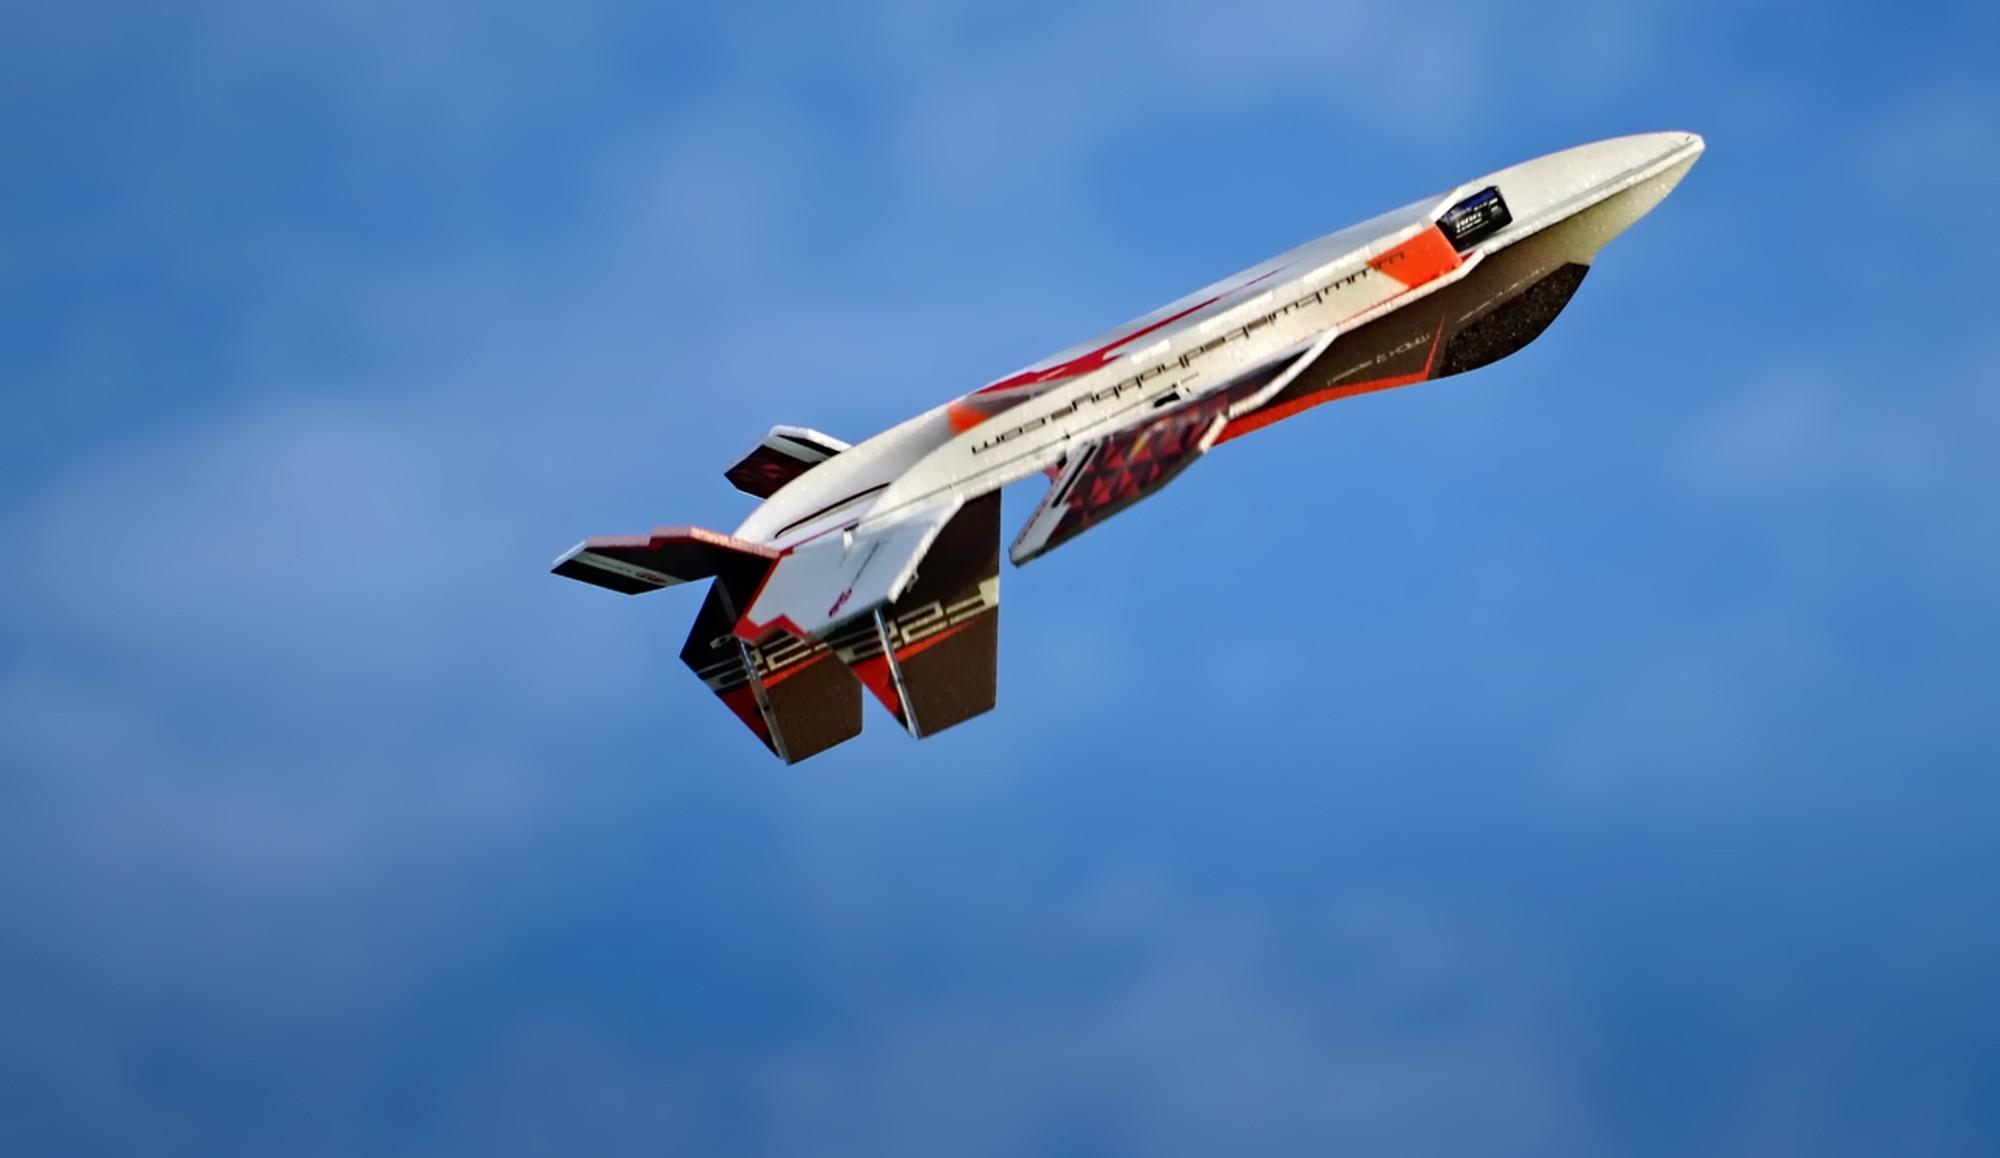 Twisted Hobbys 29 Quot Epp Raptor Jet Rc Foam 3d Plane